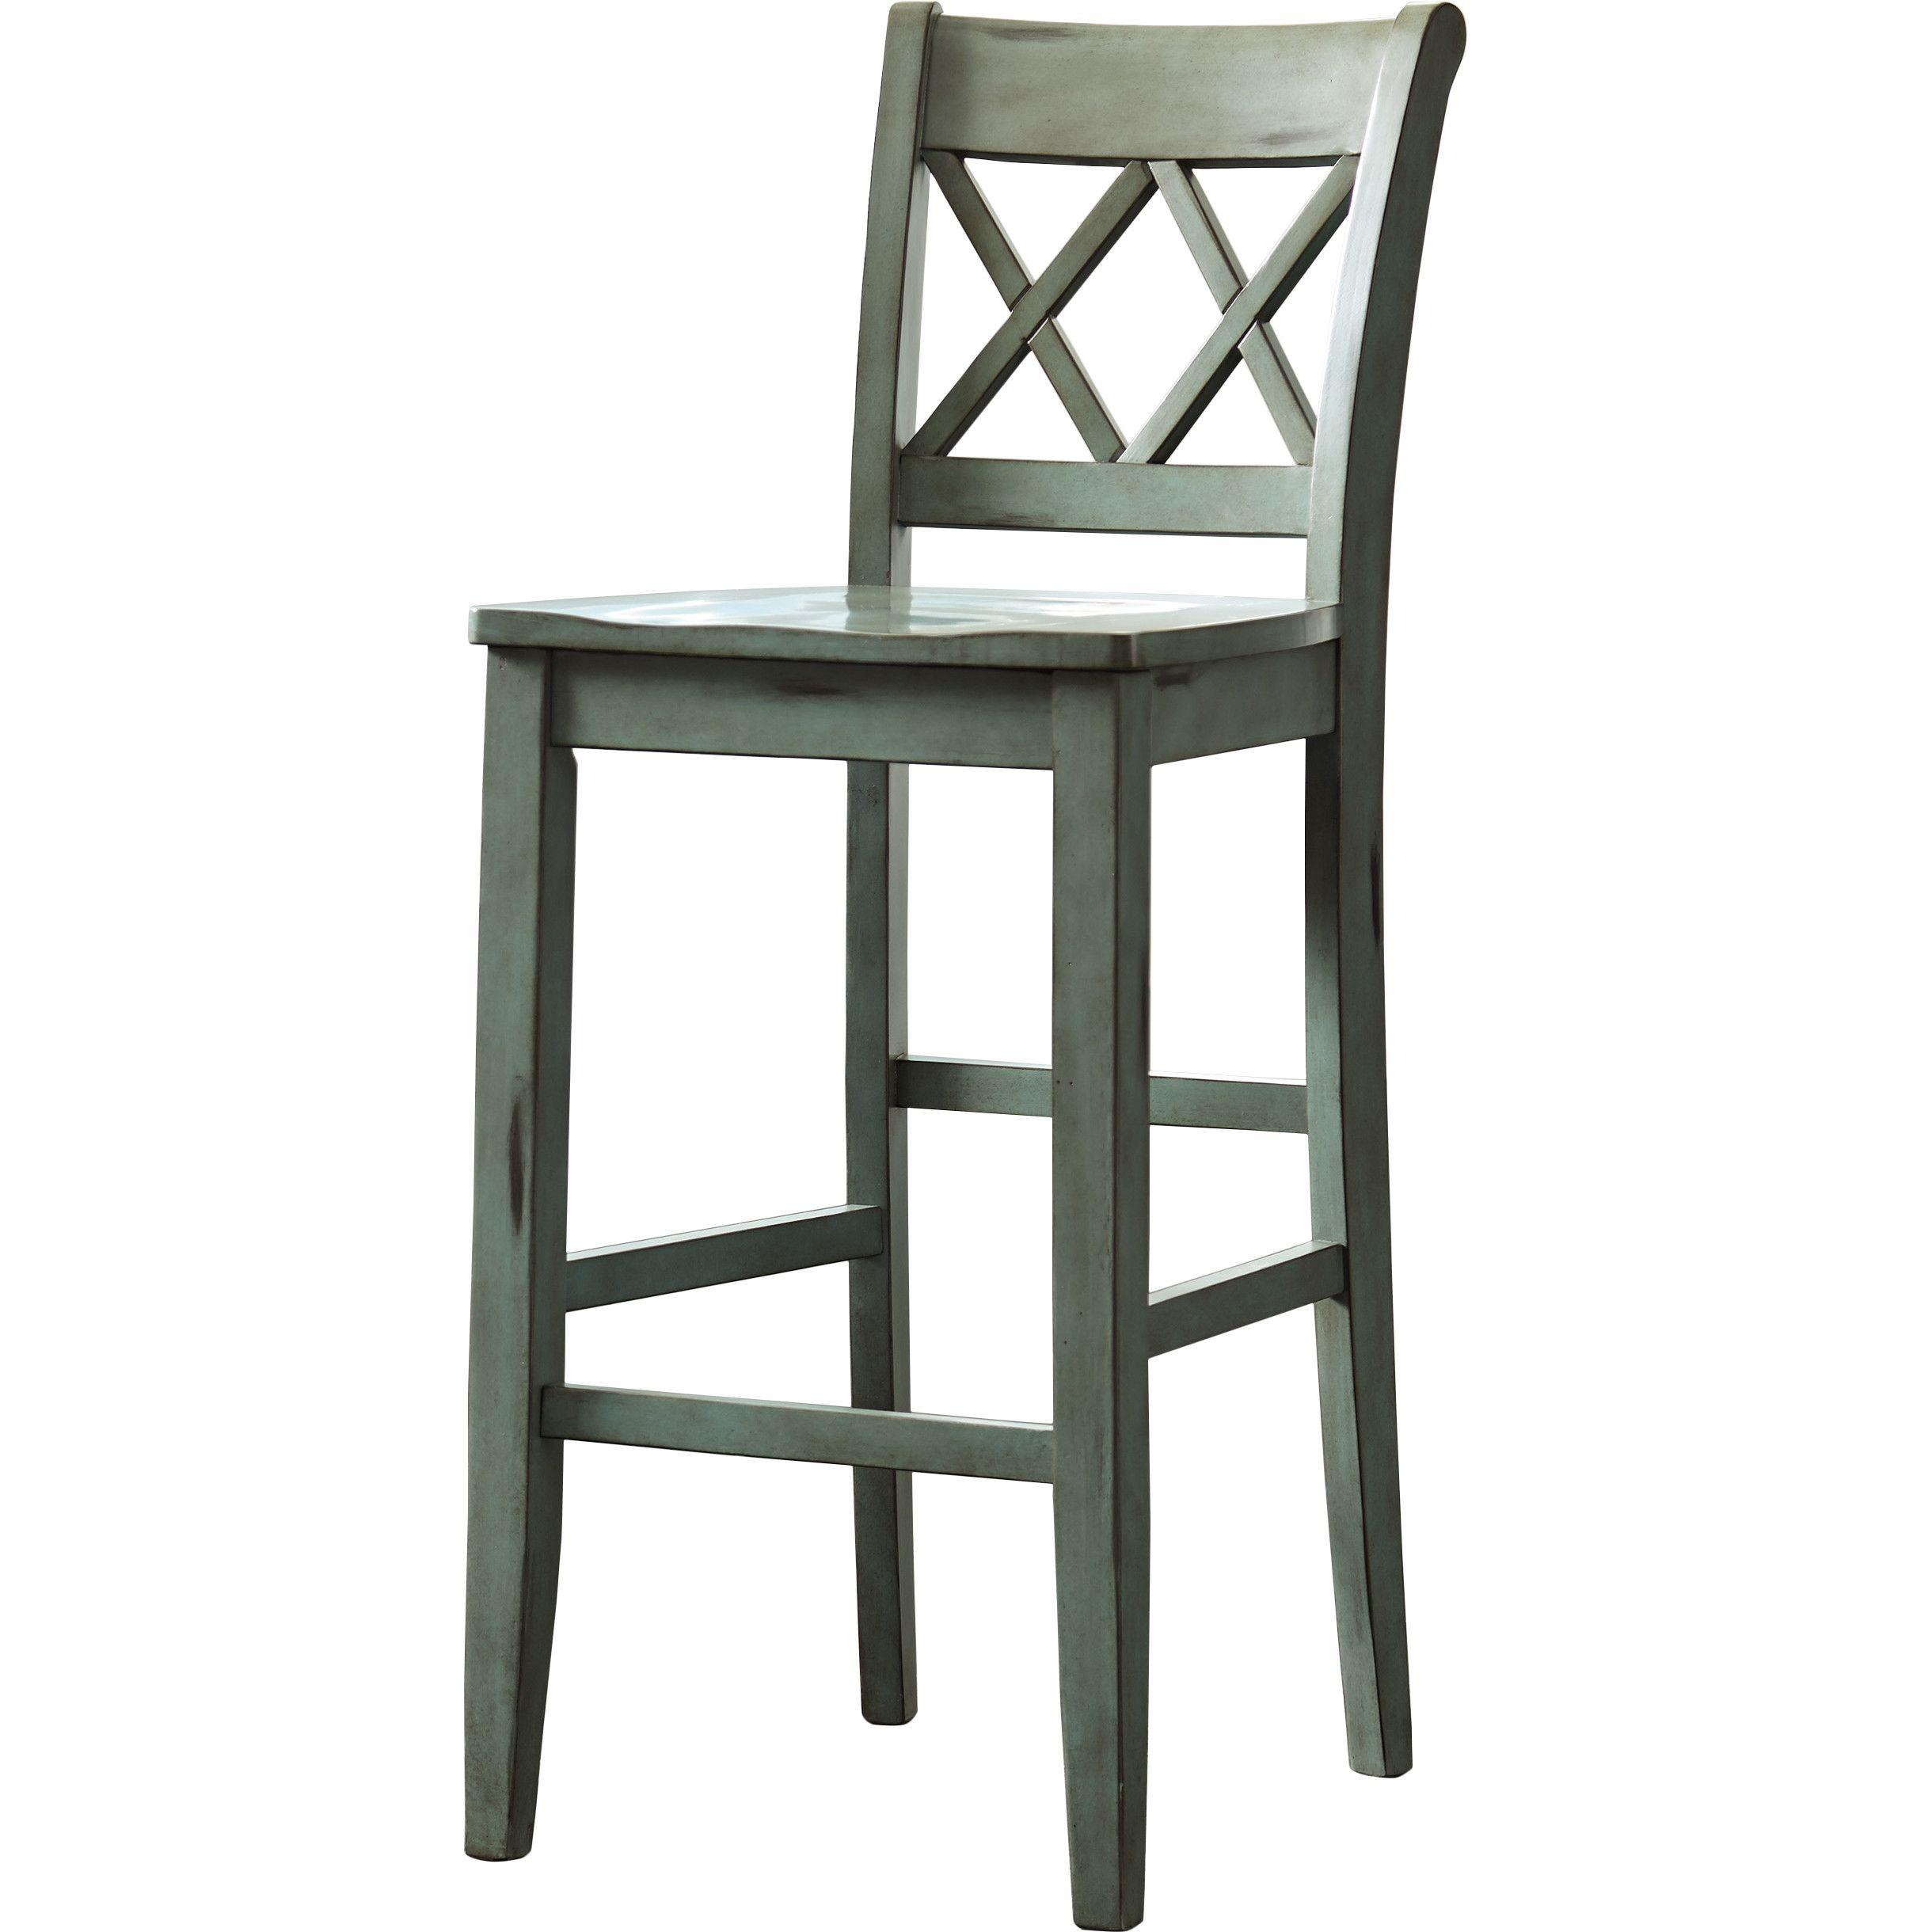 Brilliant Bolden 30 13 Bar Stool Remodel Kitchen 24 Bar Stools Inzonedesignstudio Interior Chair Design Inzonedesignstudiocom